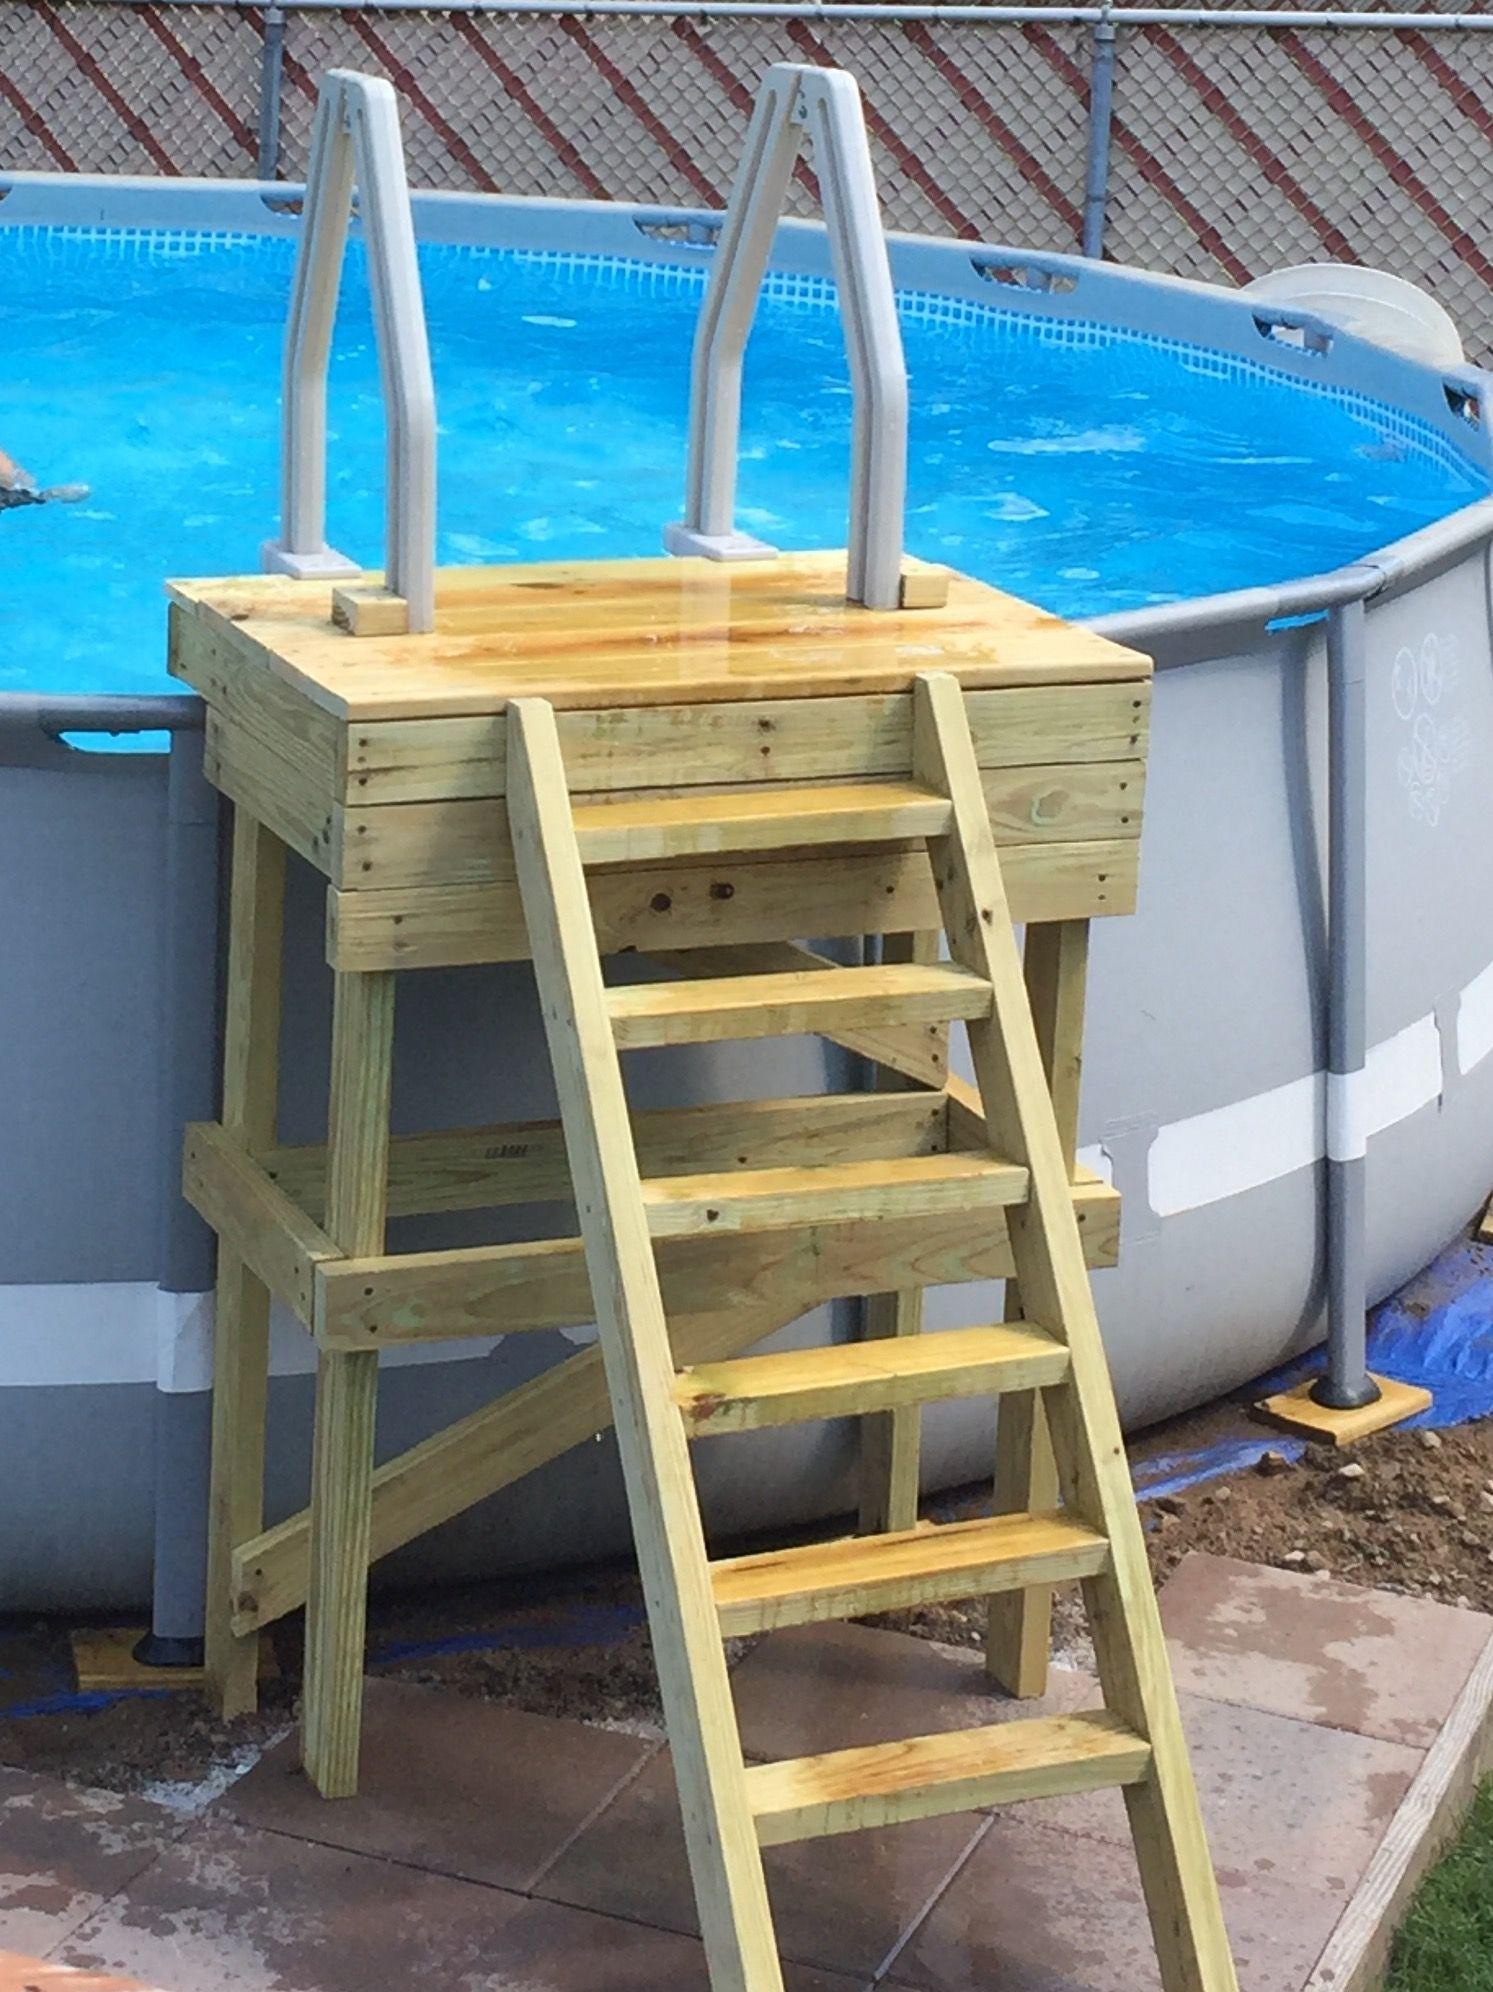 Platform with ladder for Intex Steel Frame pool (18' x 52